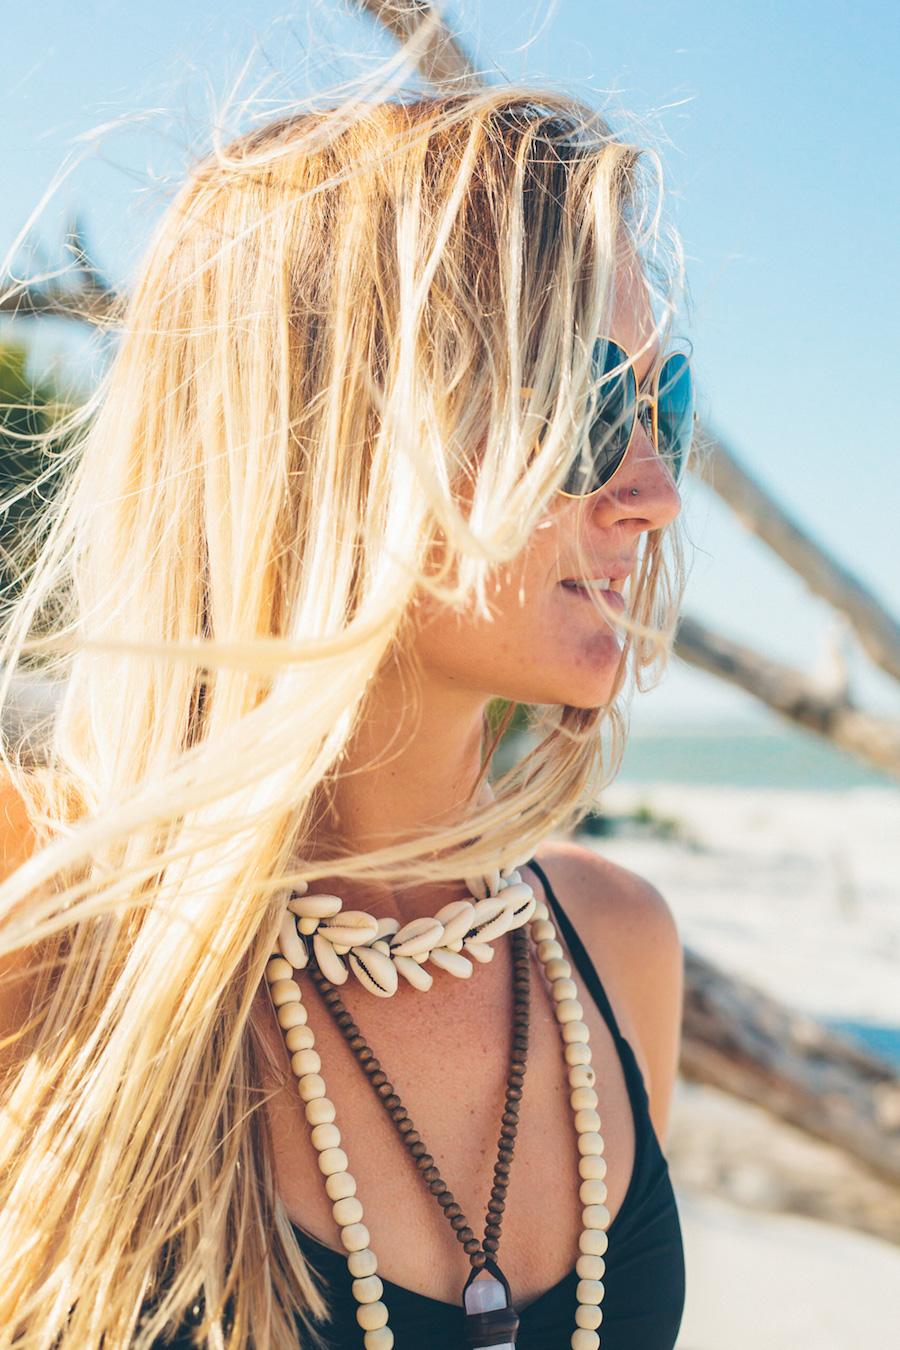 beach_model-3058